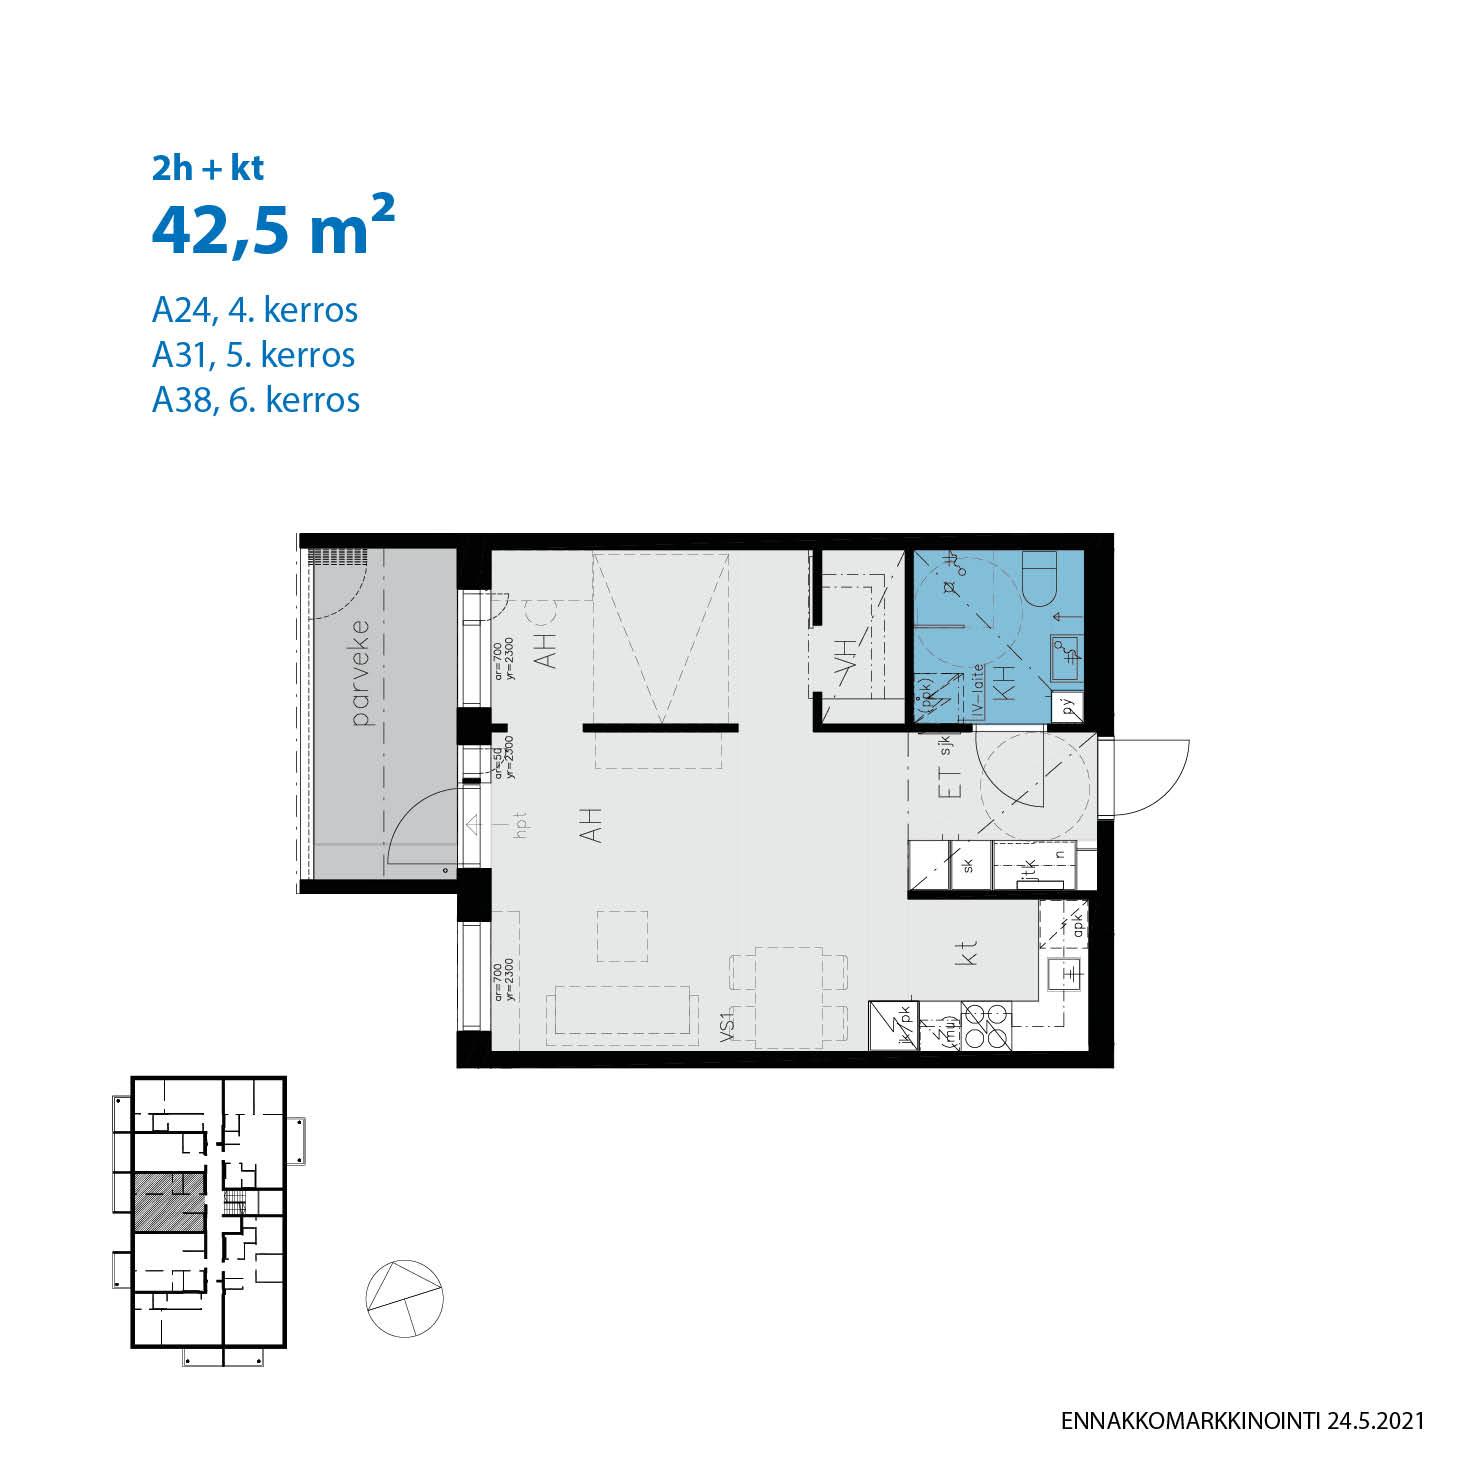 A38, 42.5 m<sup>2</sup>, 2h+kt